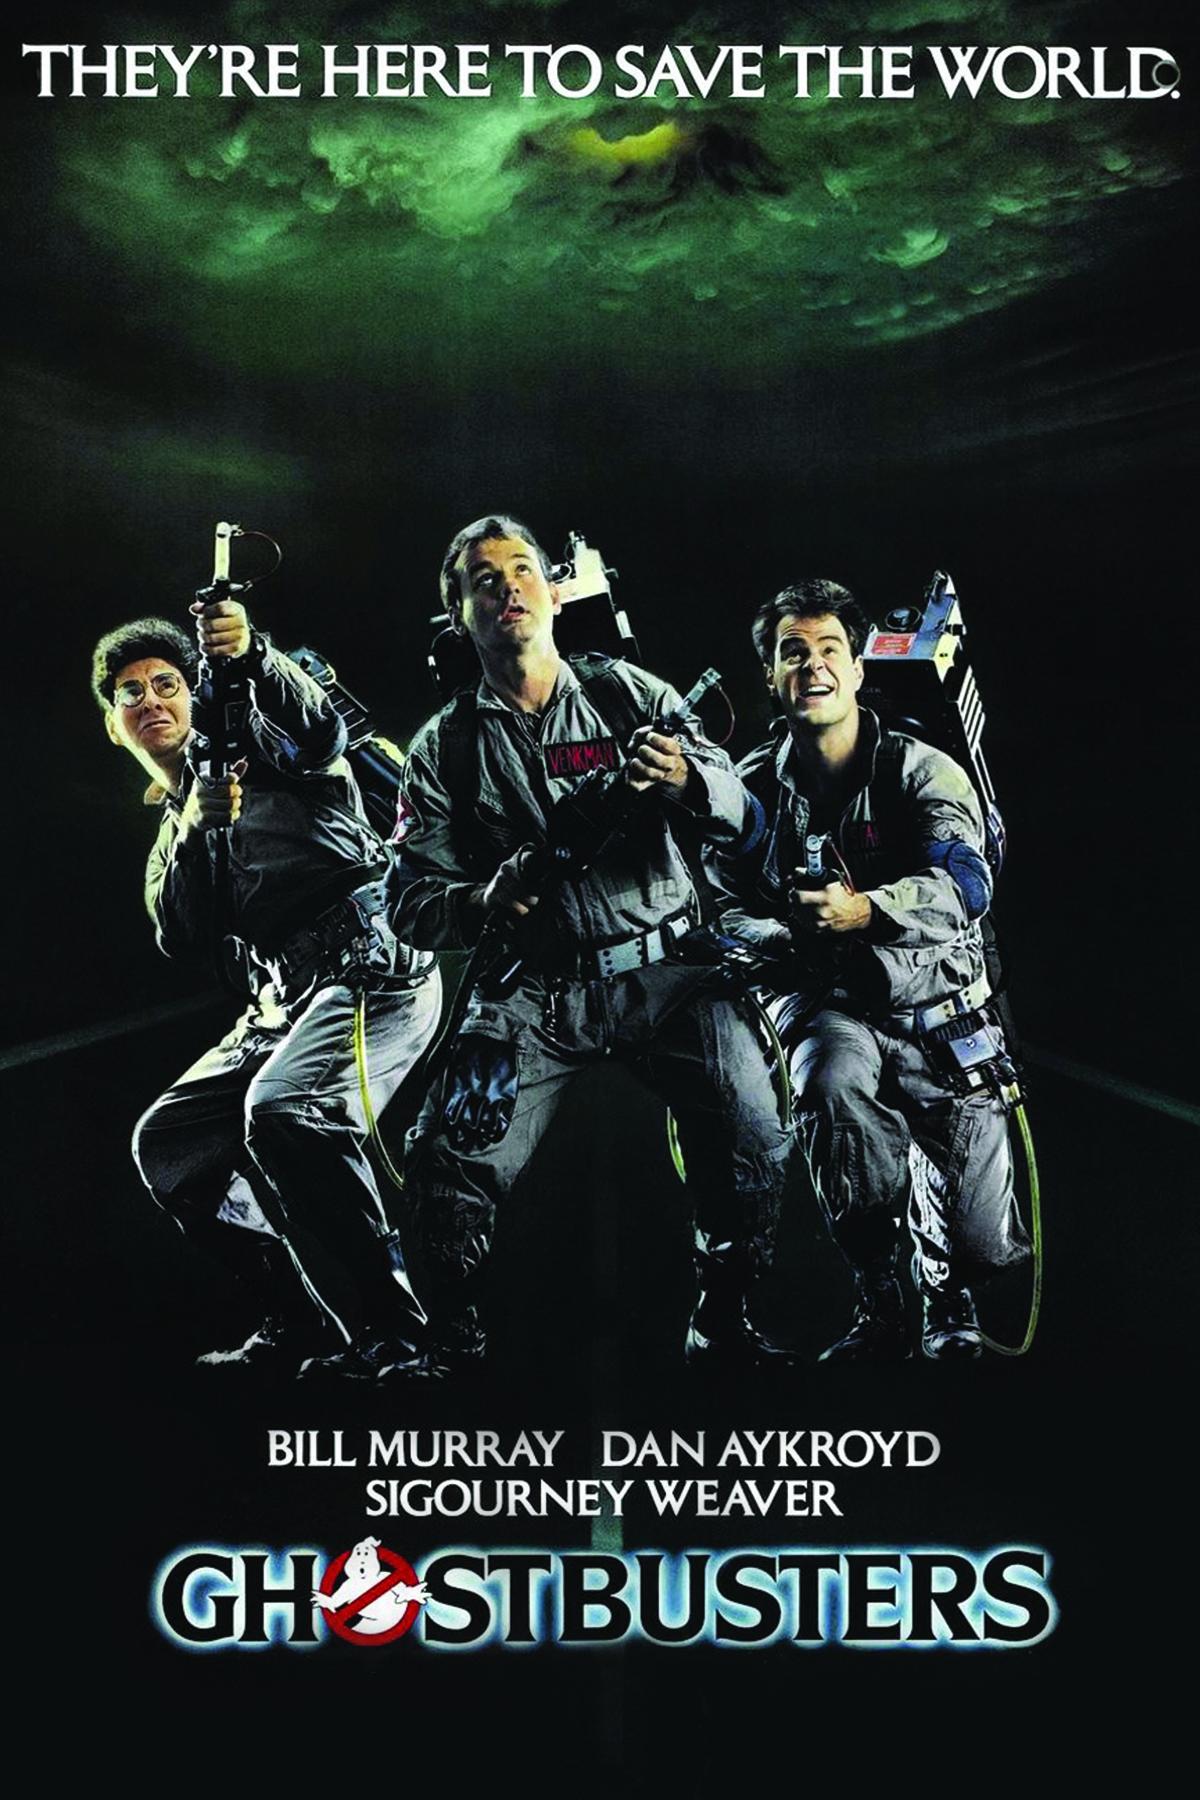 Ghostbusters (1984) • PG